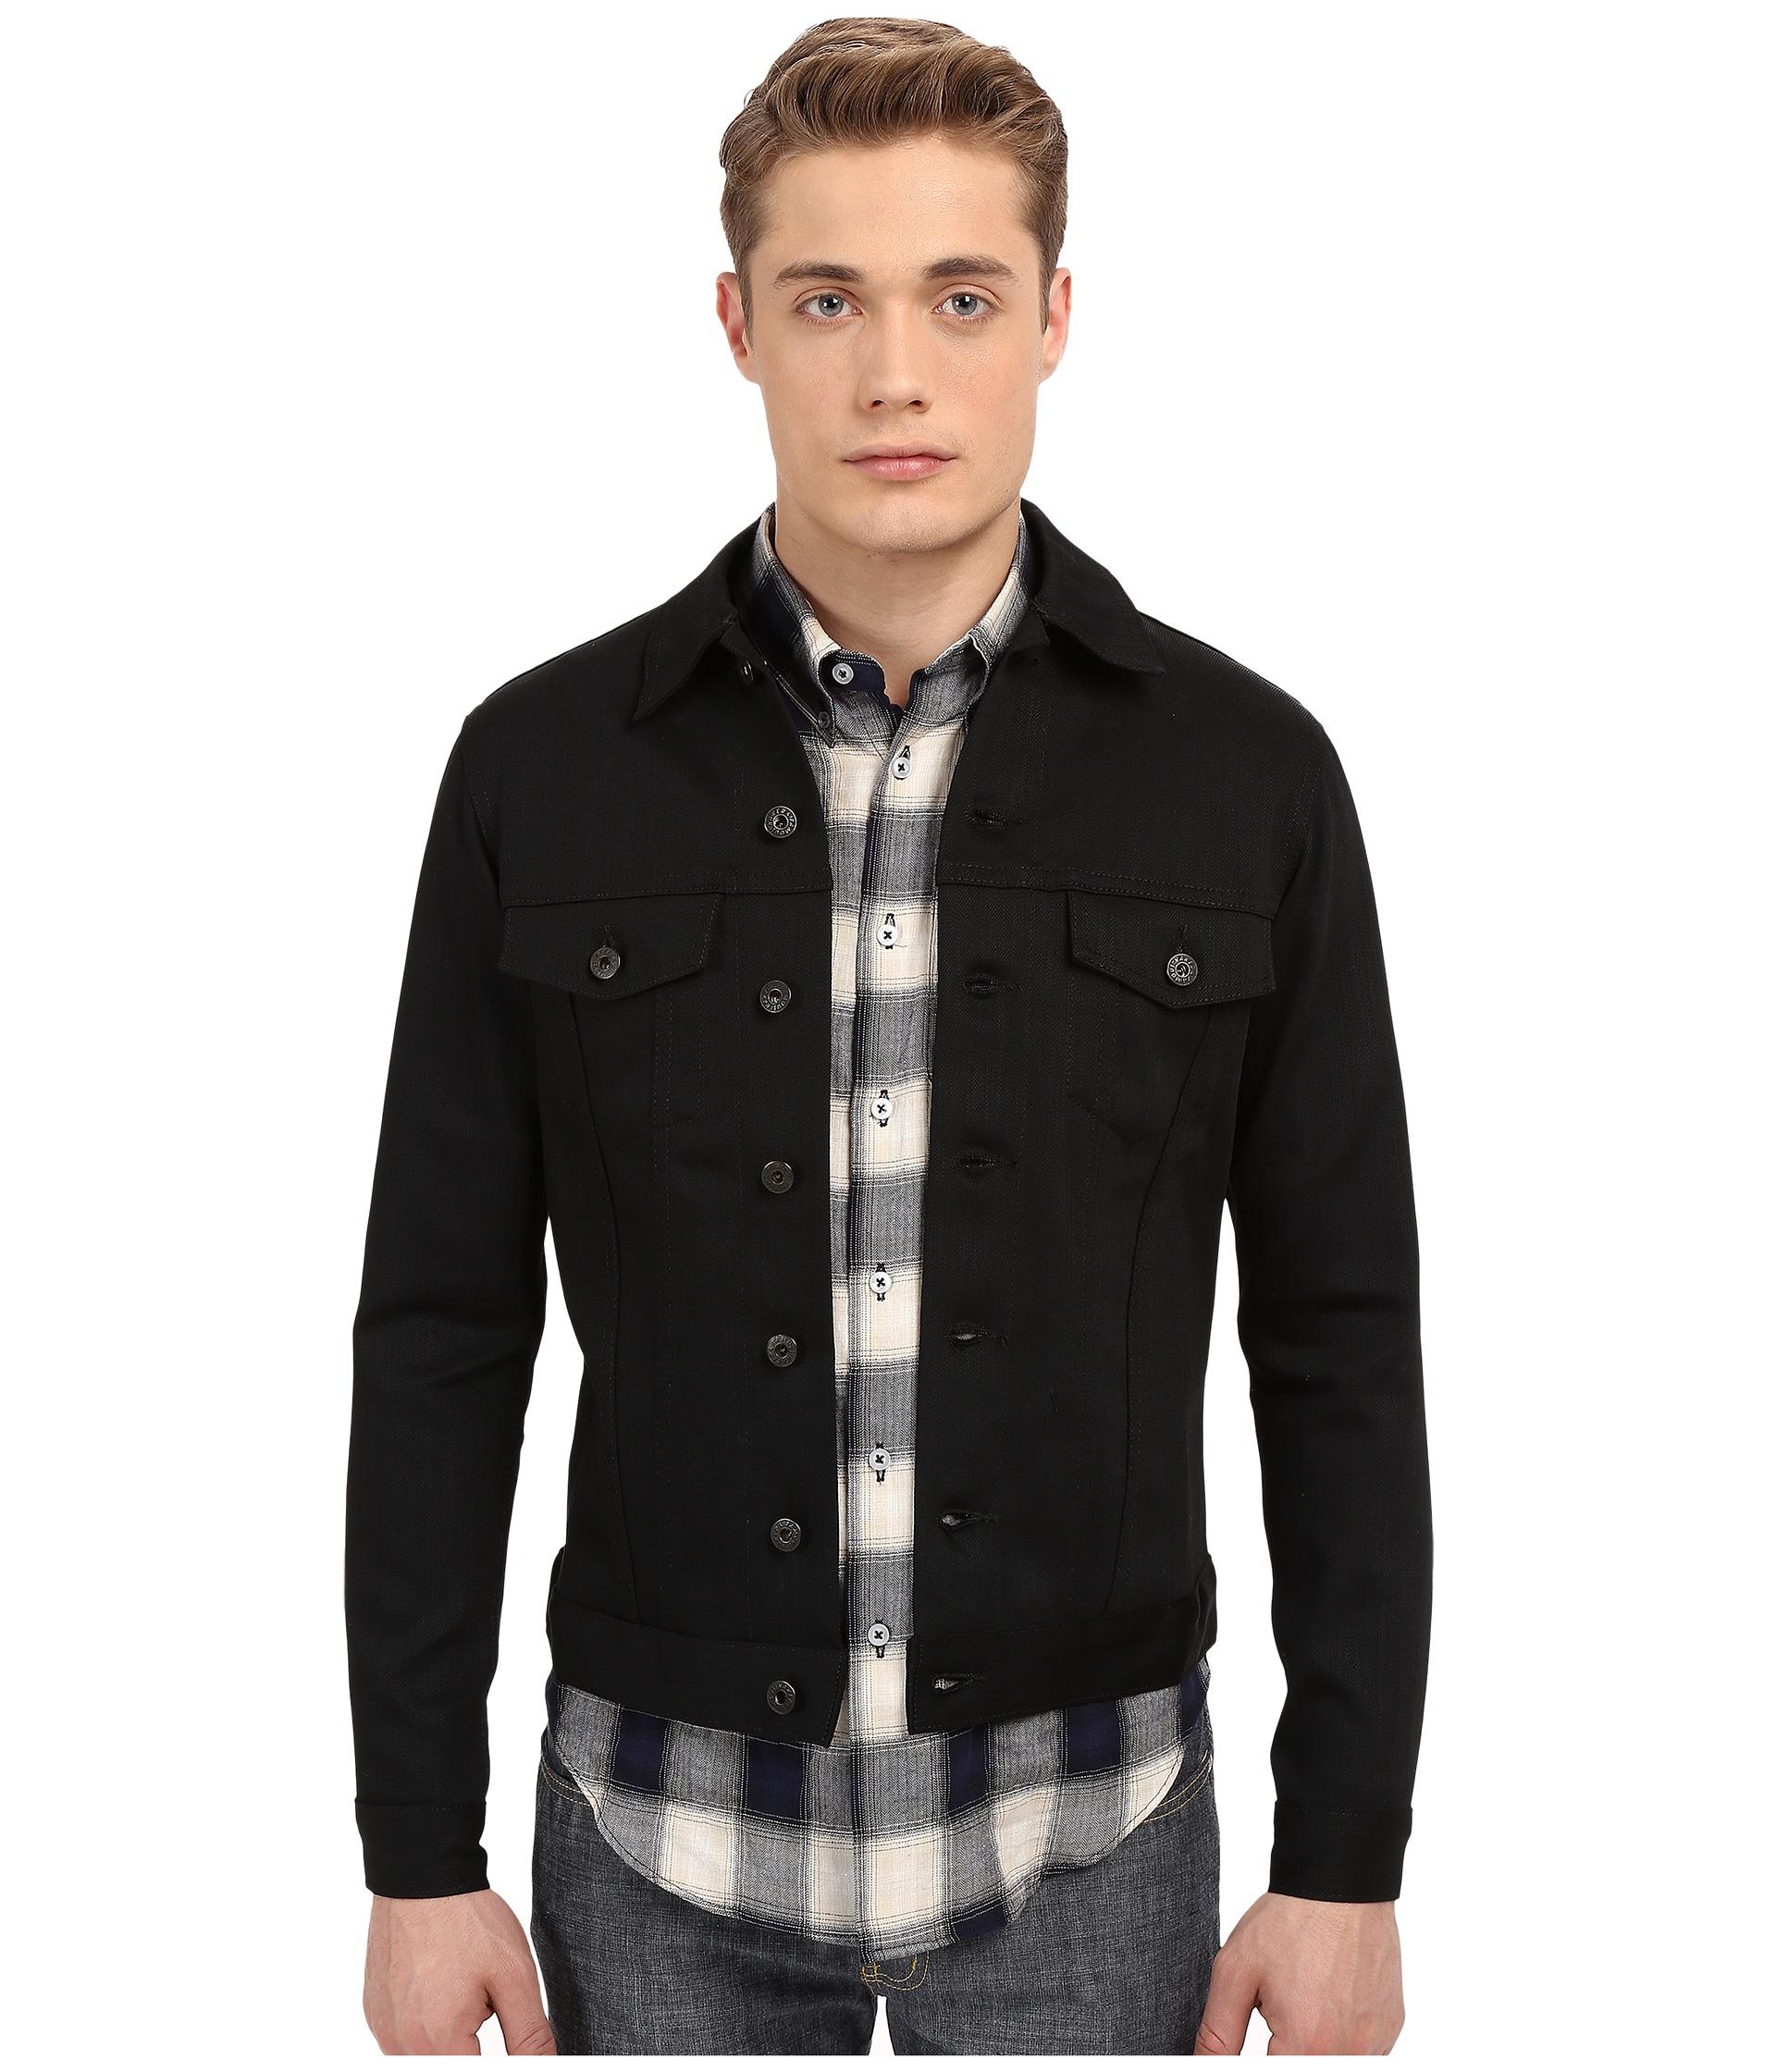 Mens Black Denim Jacket | Gommap Blog